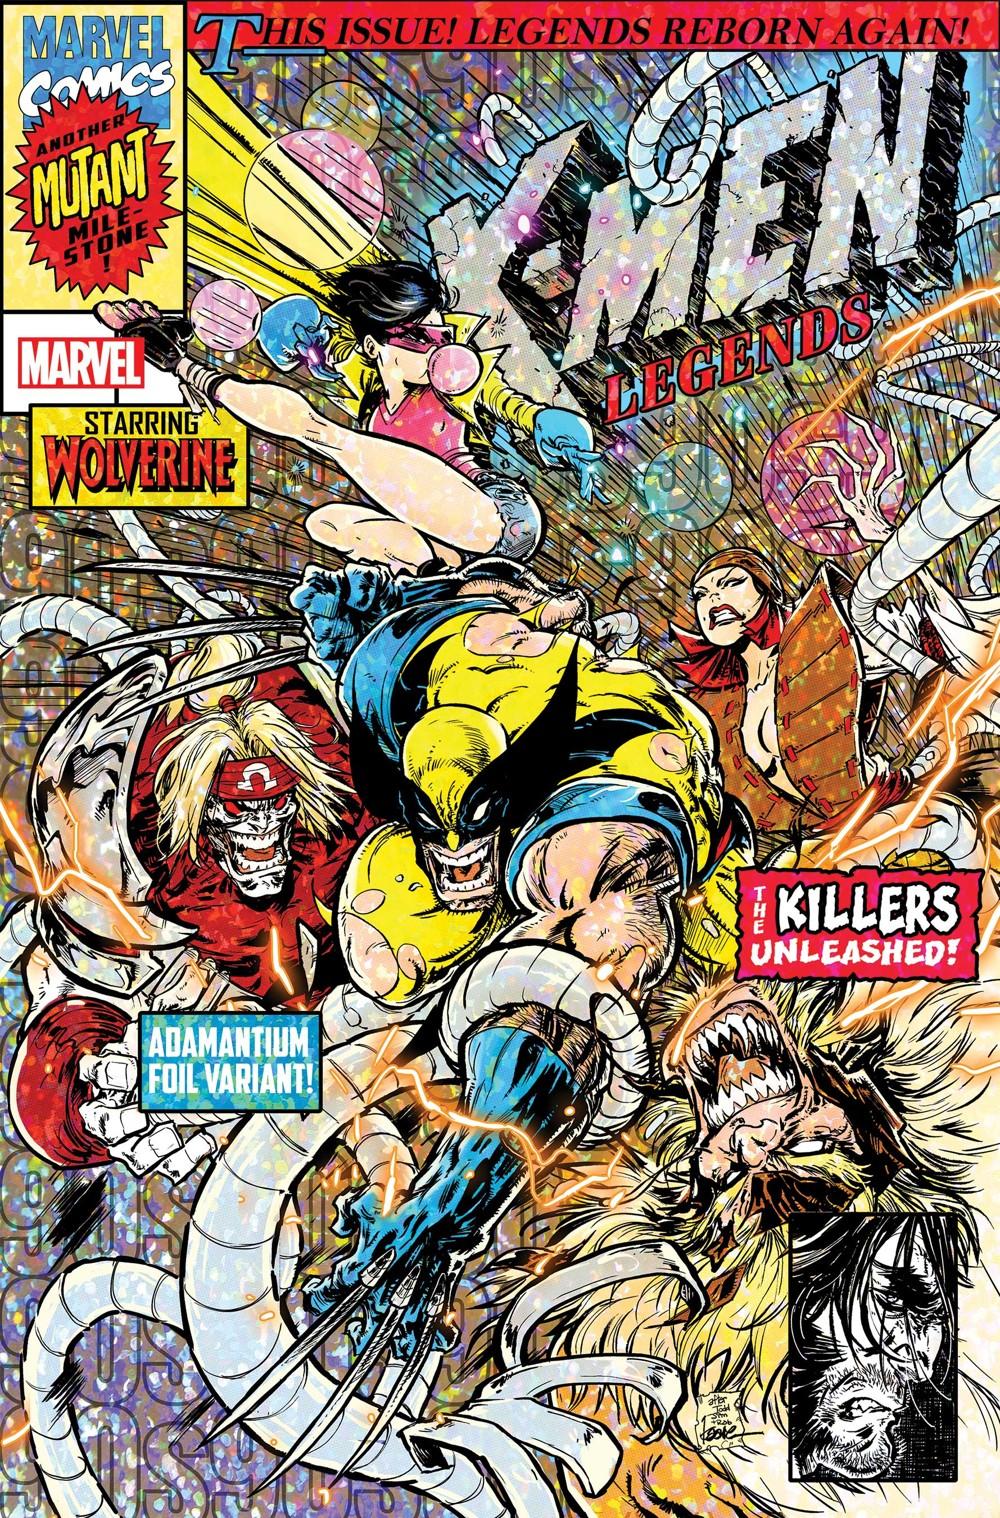 XMLEGENDS2021009-KaareAndrewsVar Marvel Comics November 2021 Solicitations